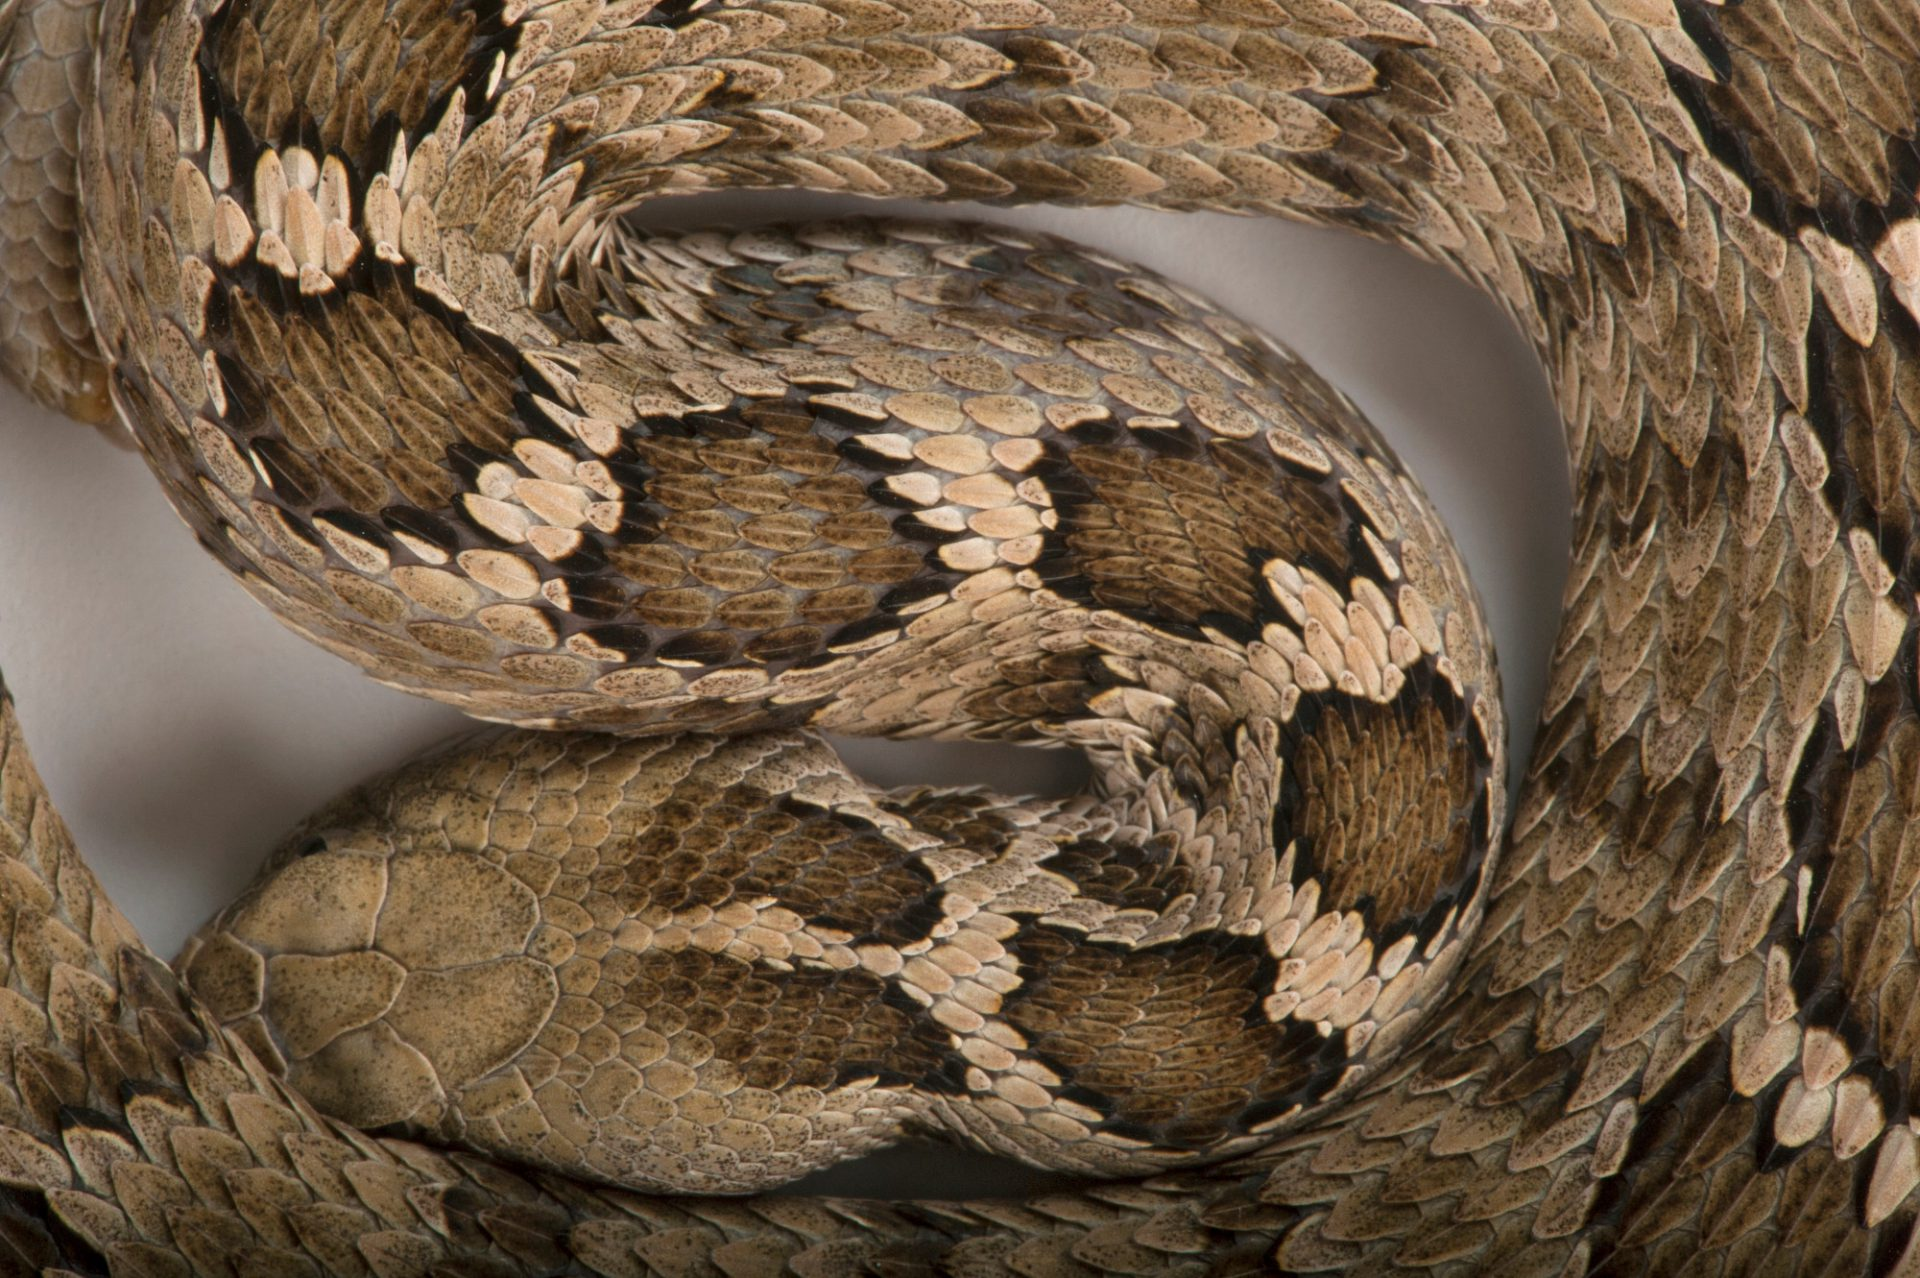 A Mexican pygmy rattlesnake (Sistrurus ravus) at the Houston Zoo.